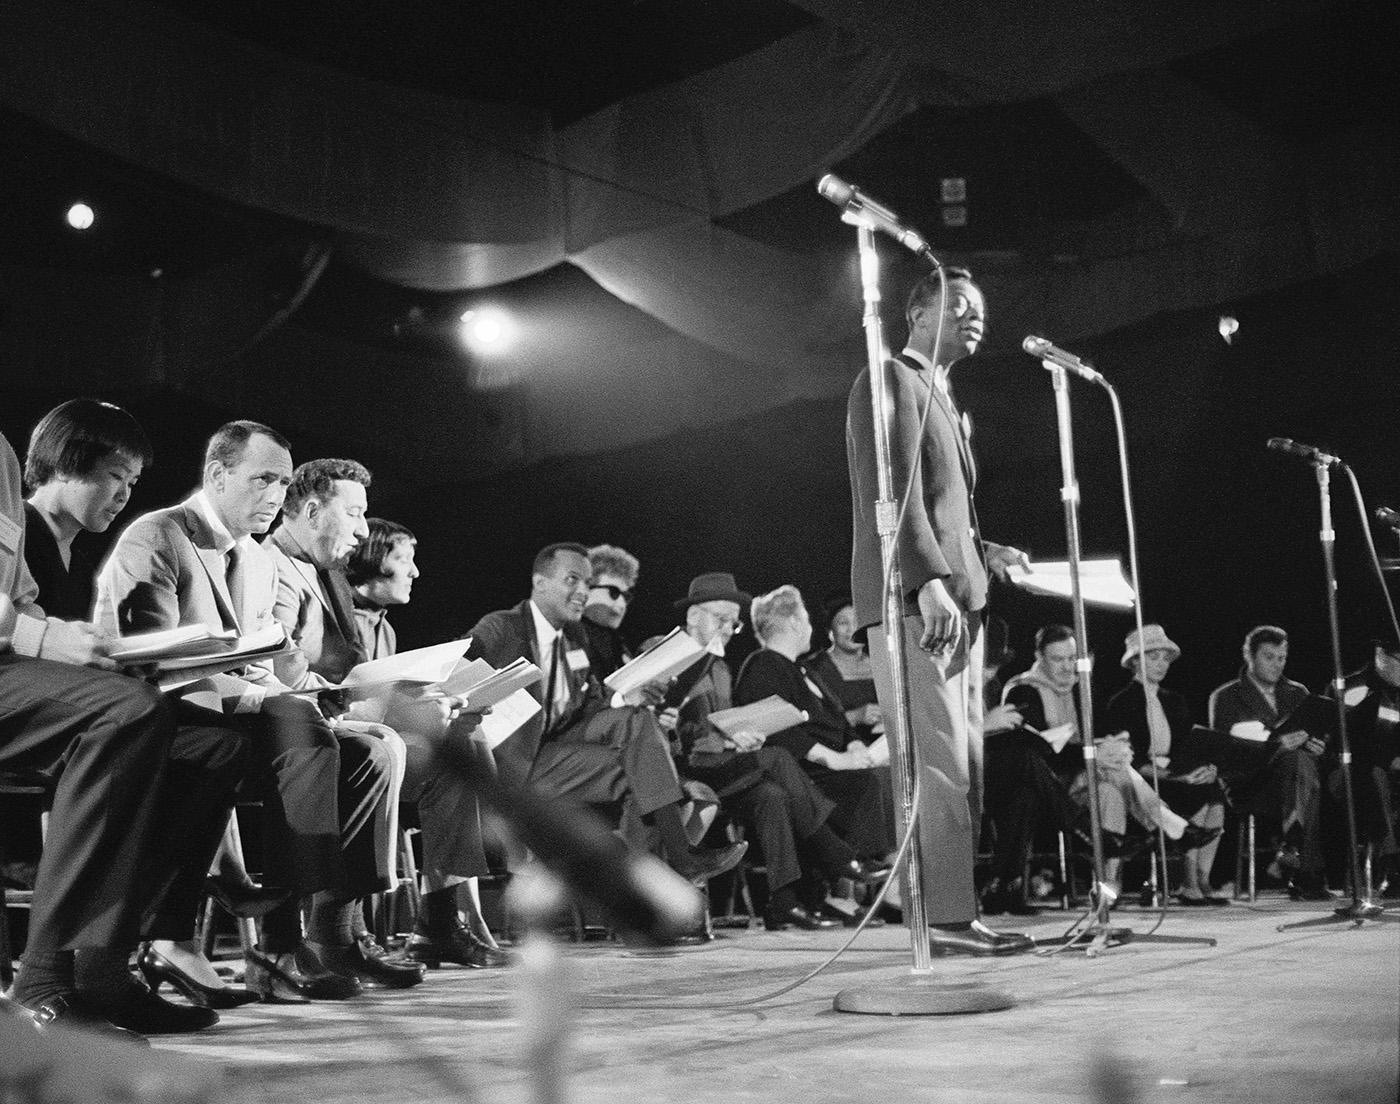 Rehearsal for JFK's Pre-Inaugural Gala. Photo: Courtesy Mark Shaw